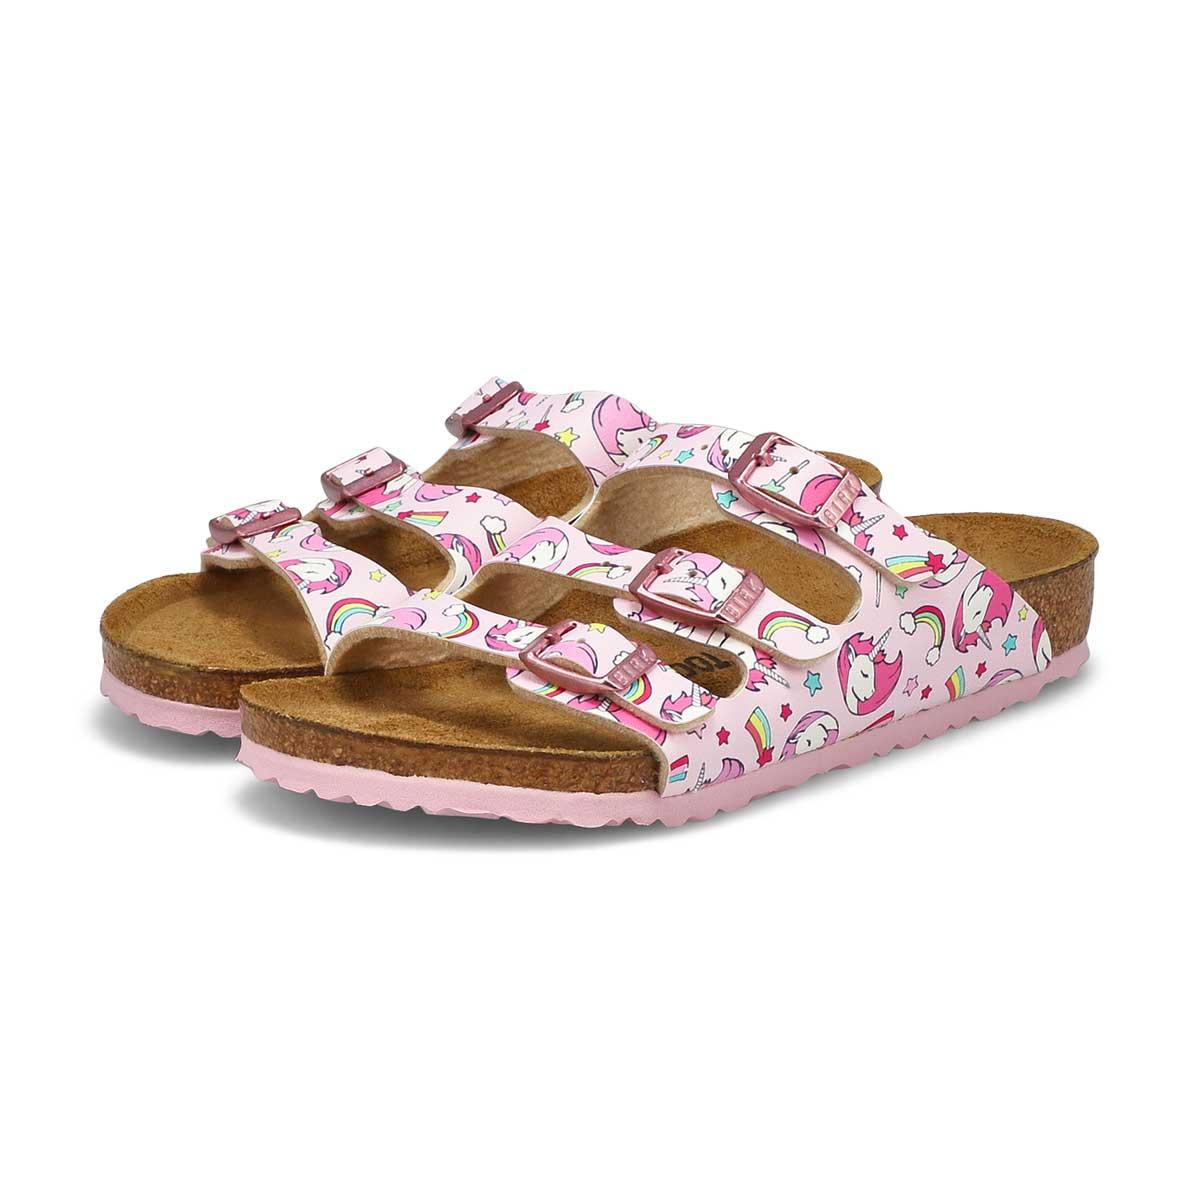 Girls' Florida BF narrow sandals - unicorn pink